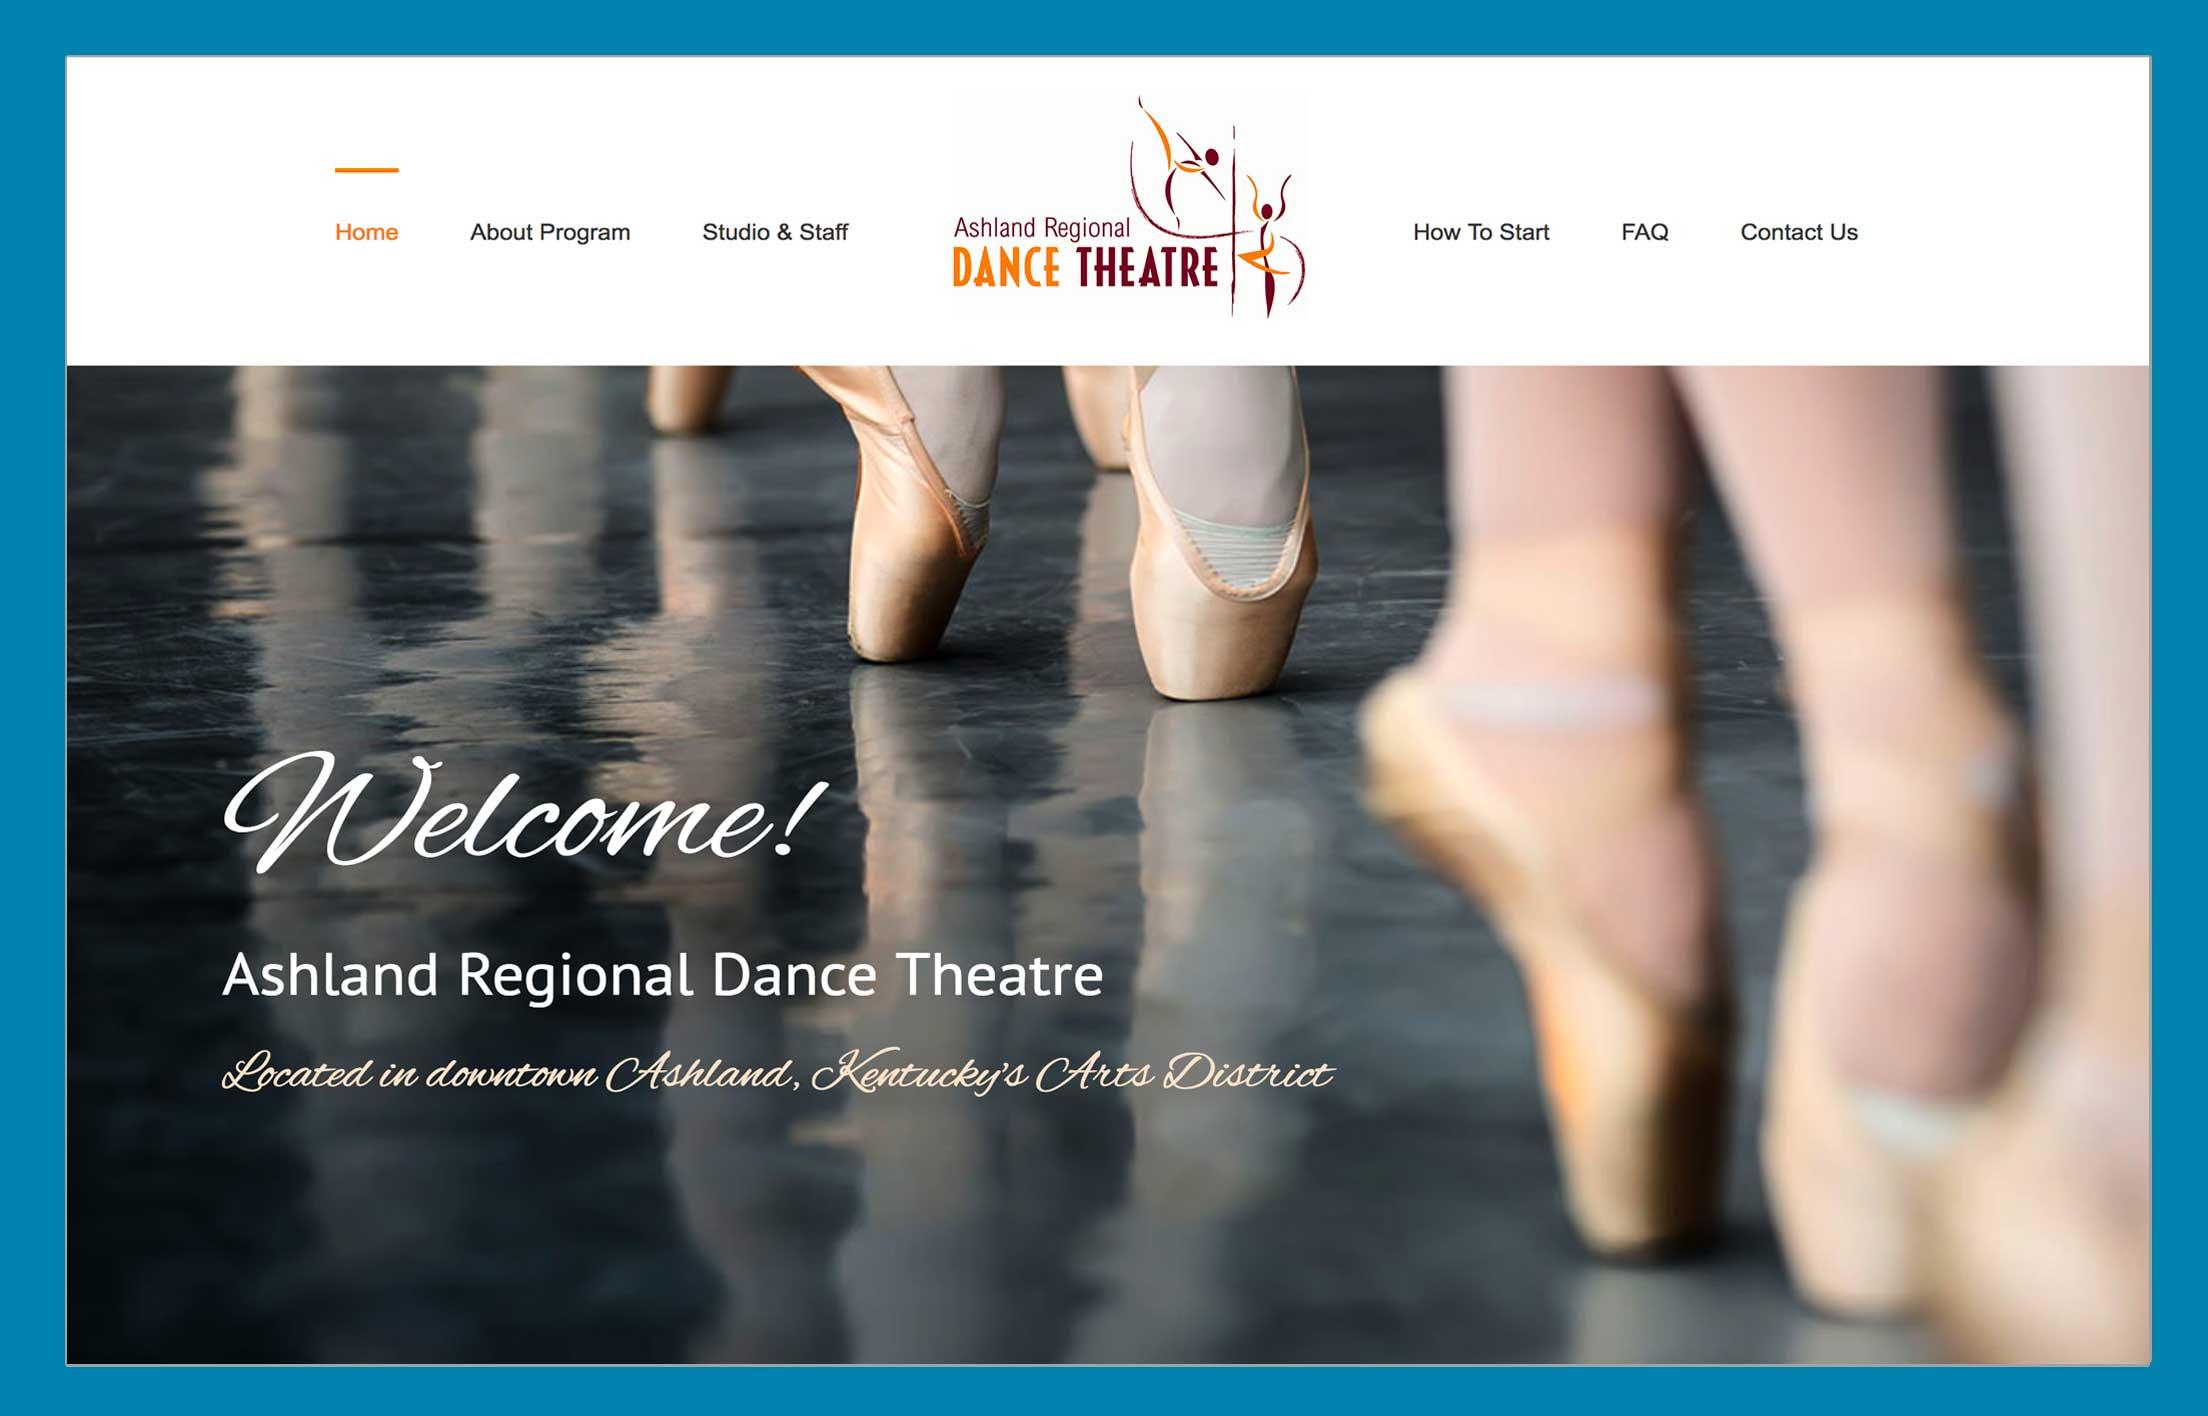 Ashland Regional Dance Theatre